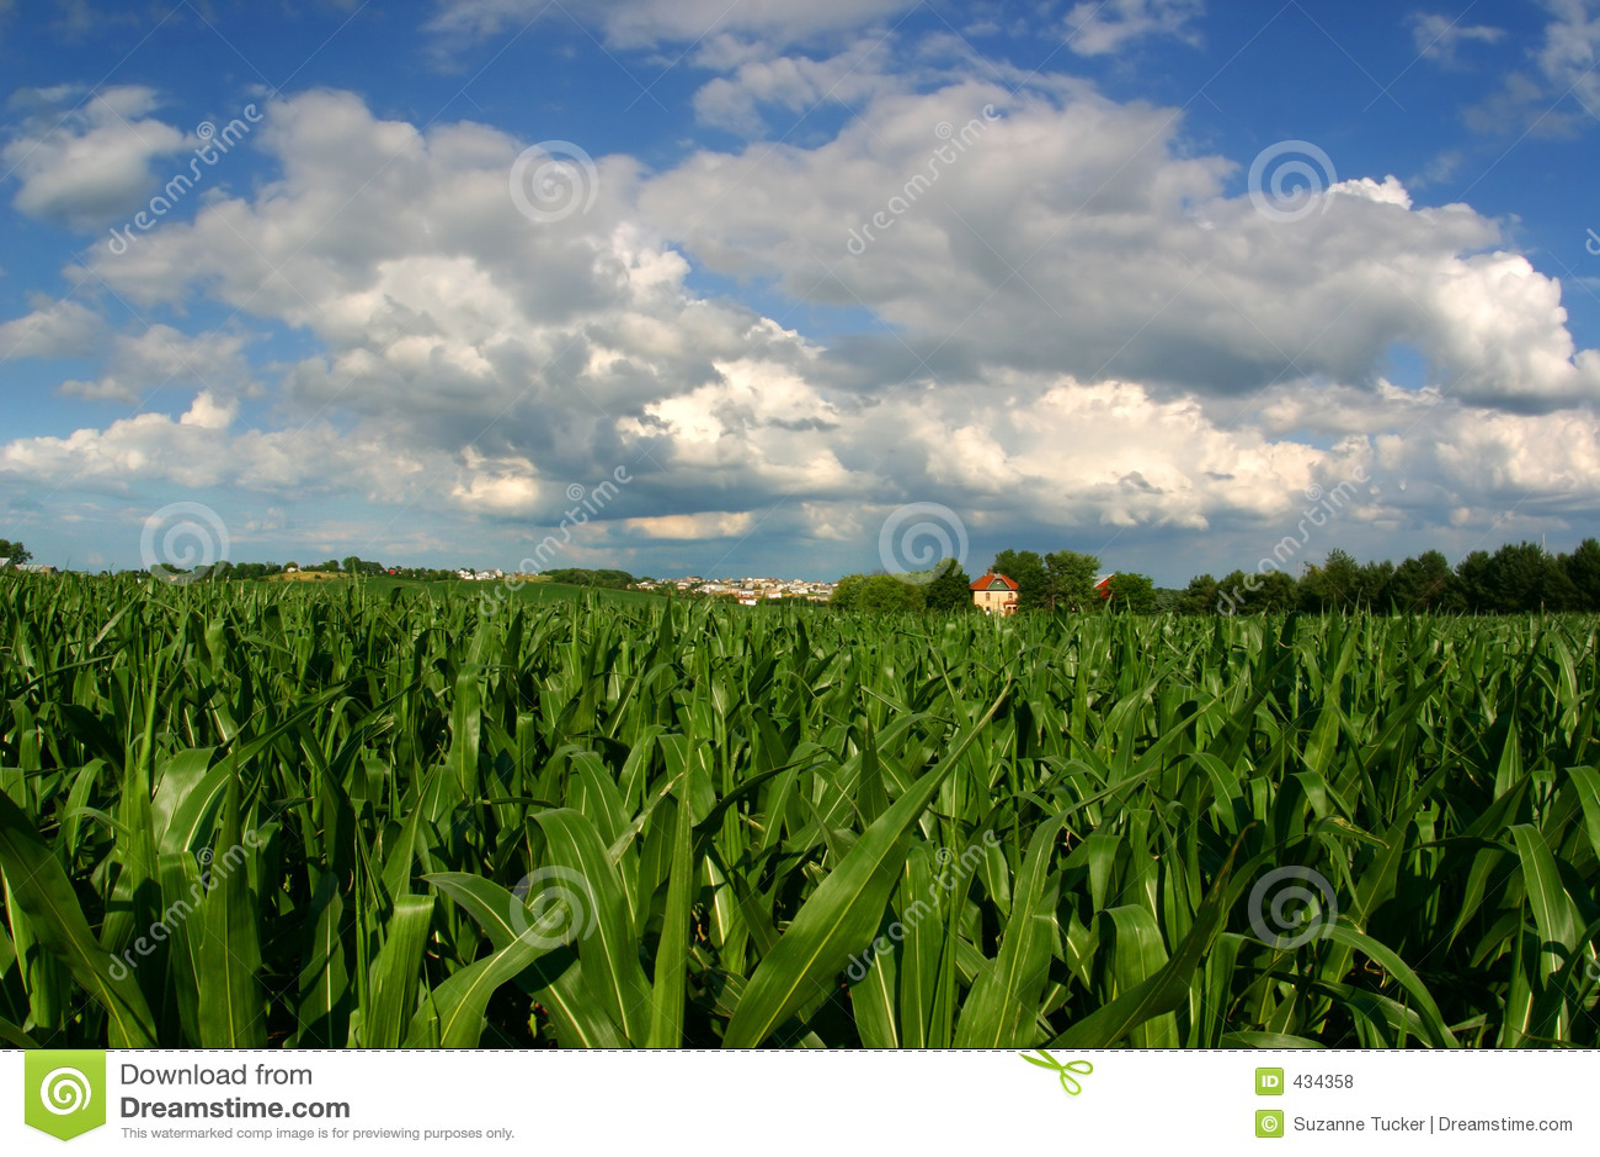 Vanishing Farmland (cornfield and house with housing development